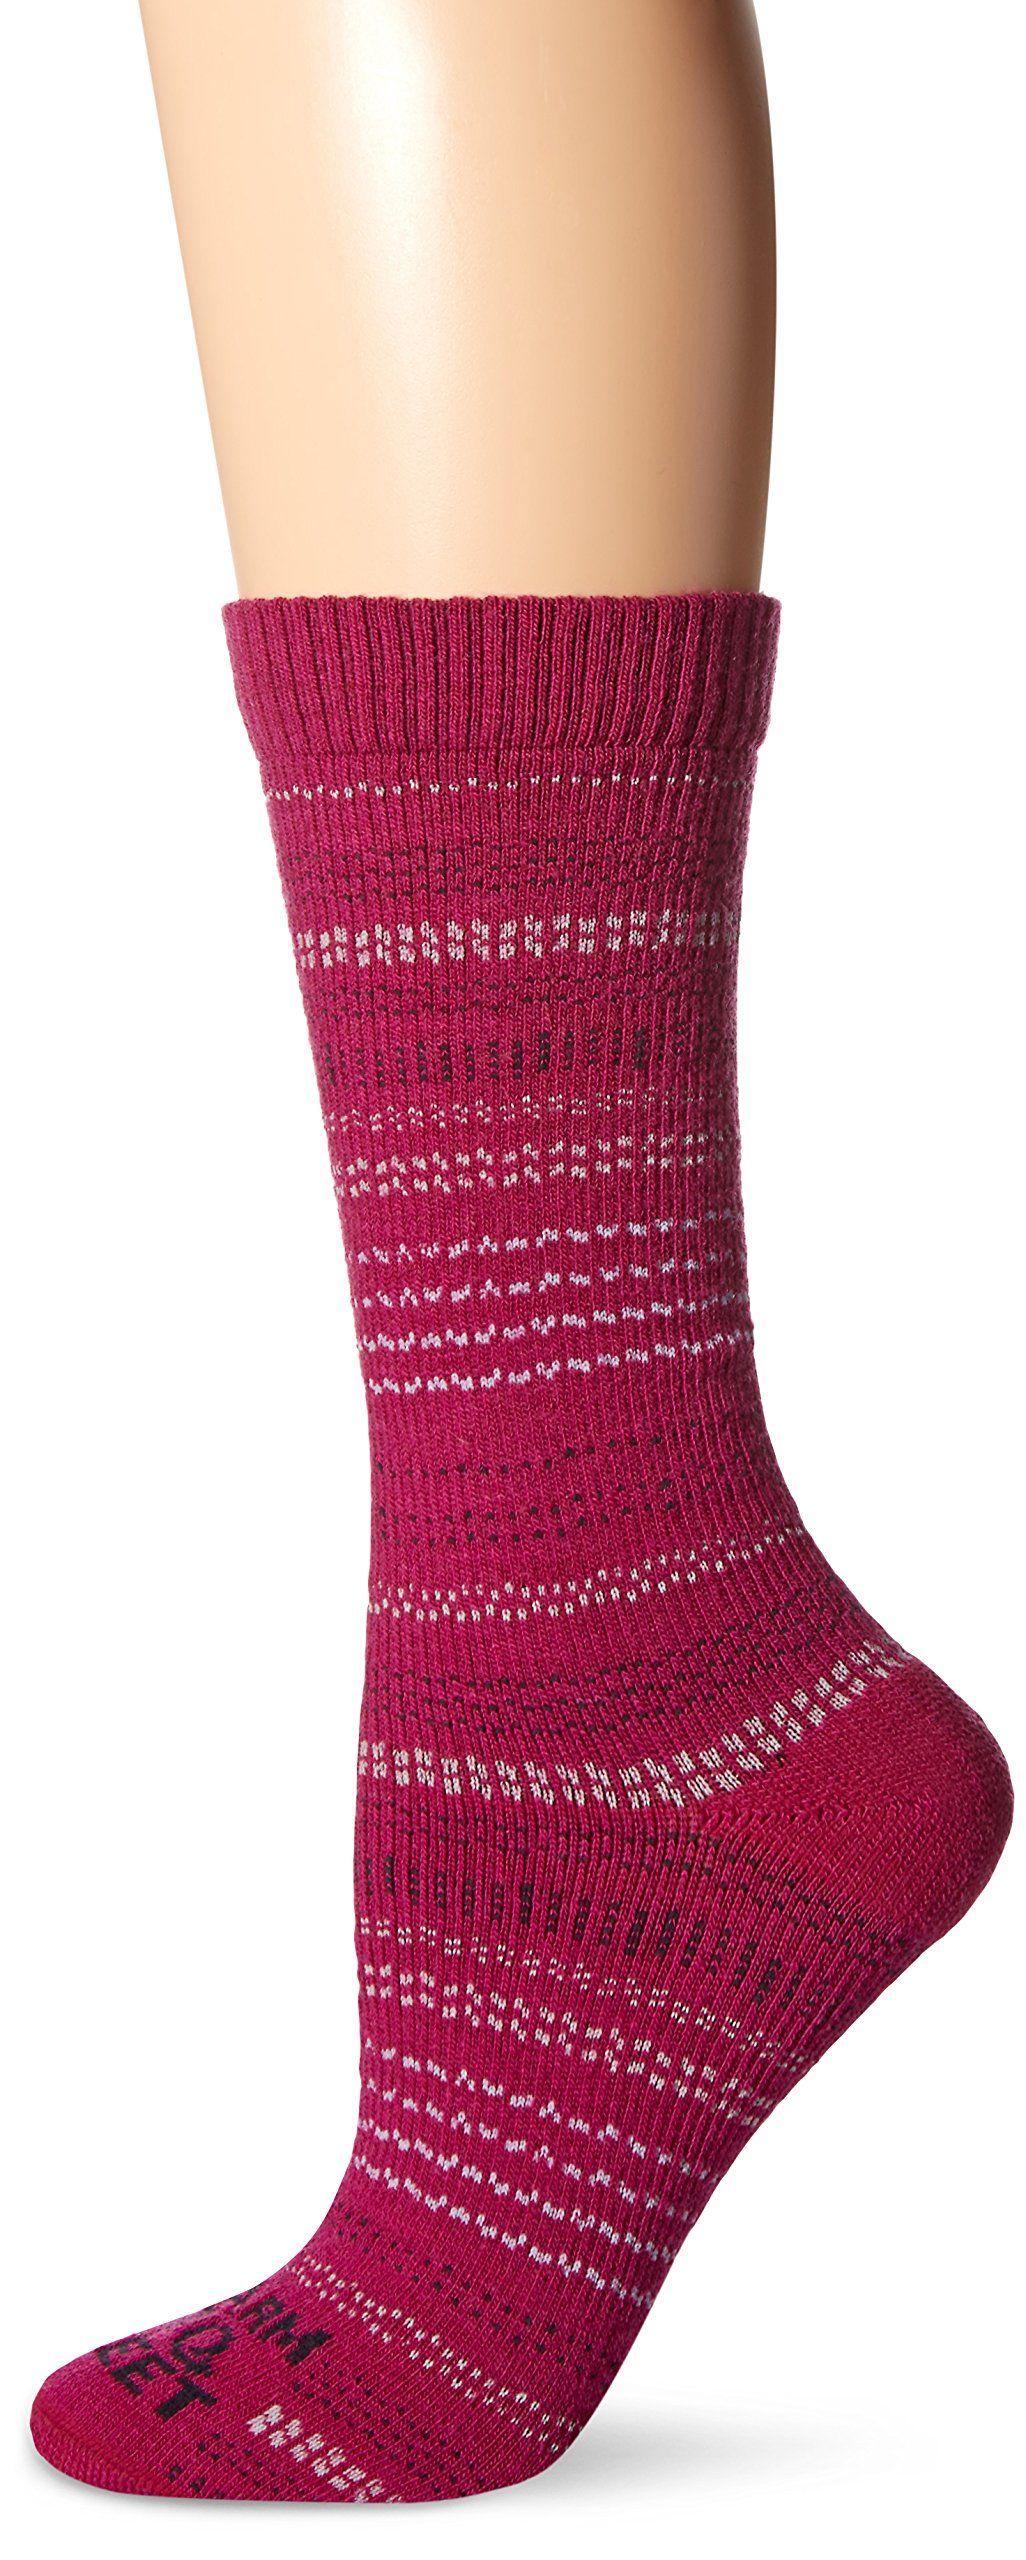 3bb7ef5564 Farm to Feet Women's Spring Creek Ultralight Crew Socks, Berry ...